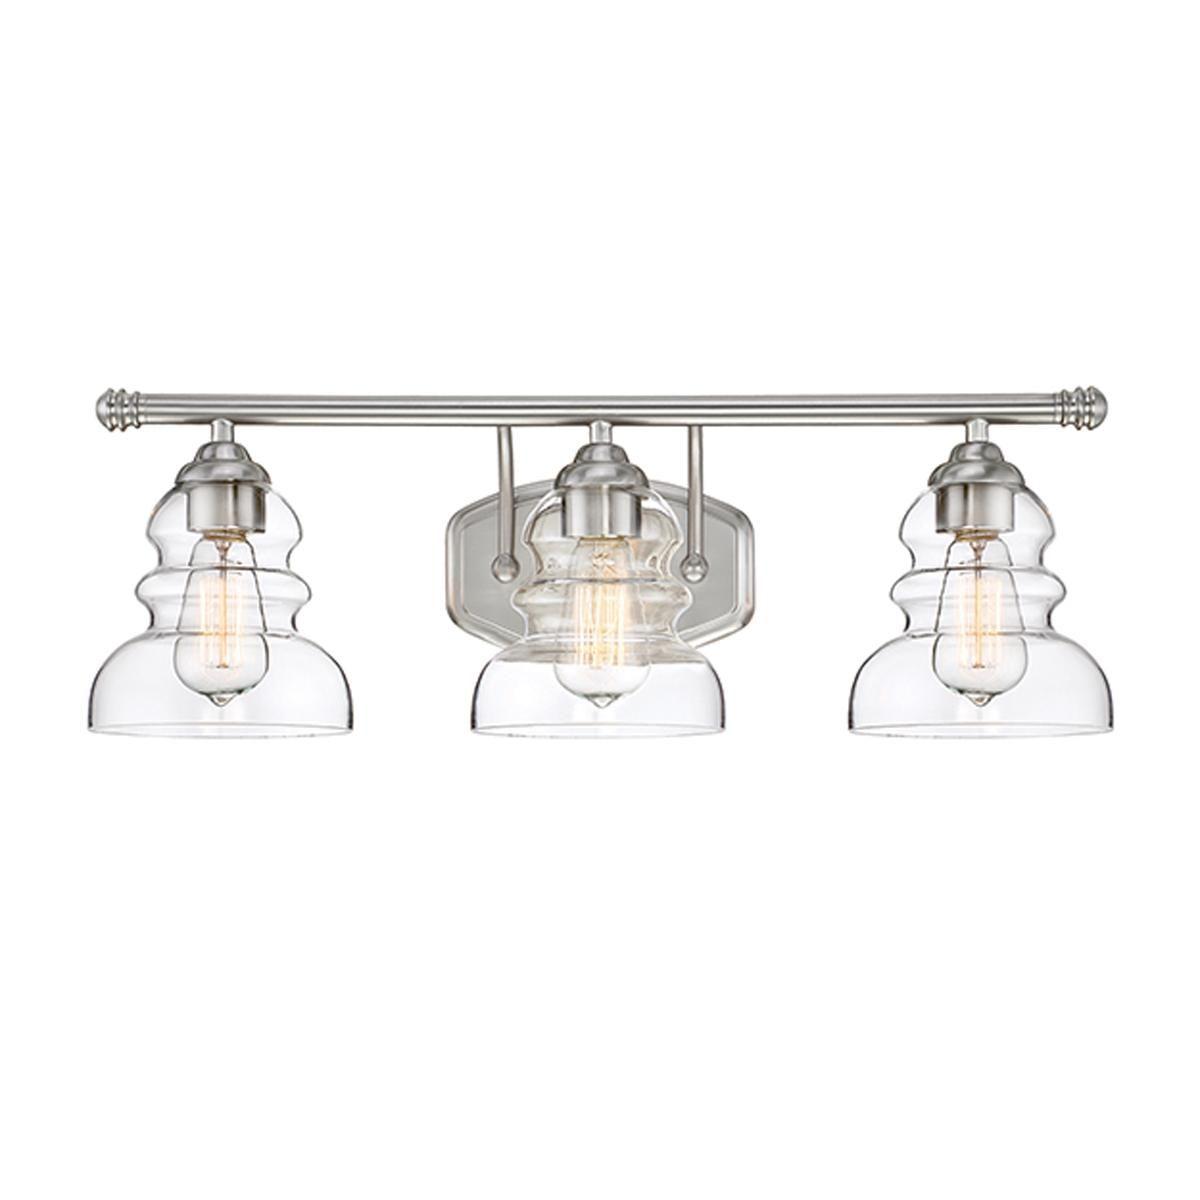 Modern Ridged Shade Vanity Light 3